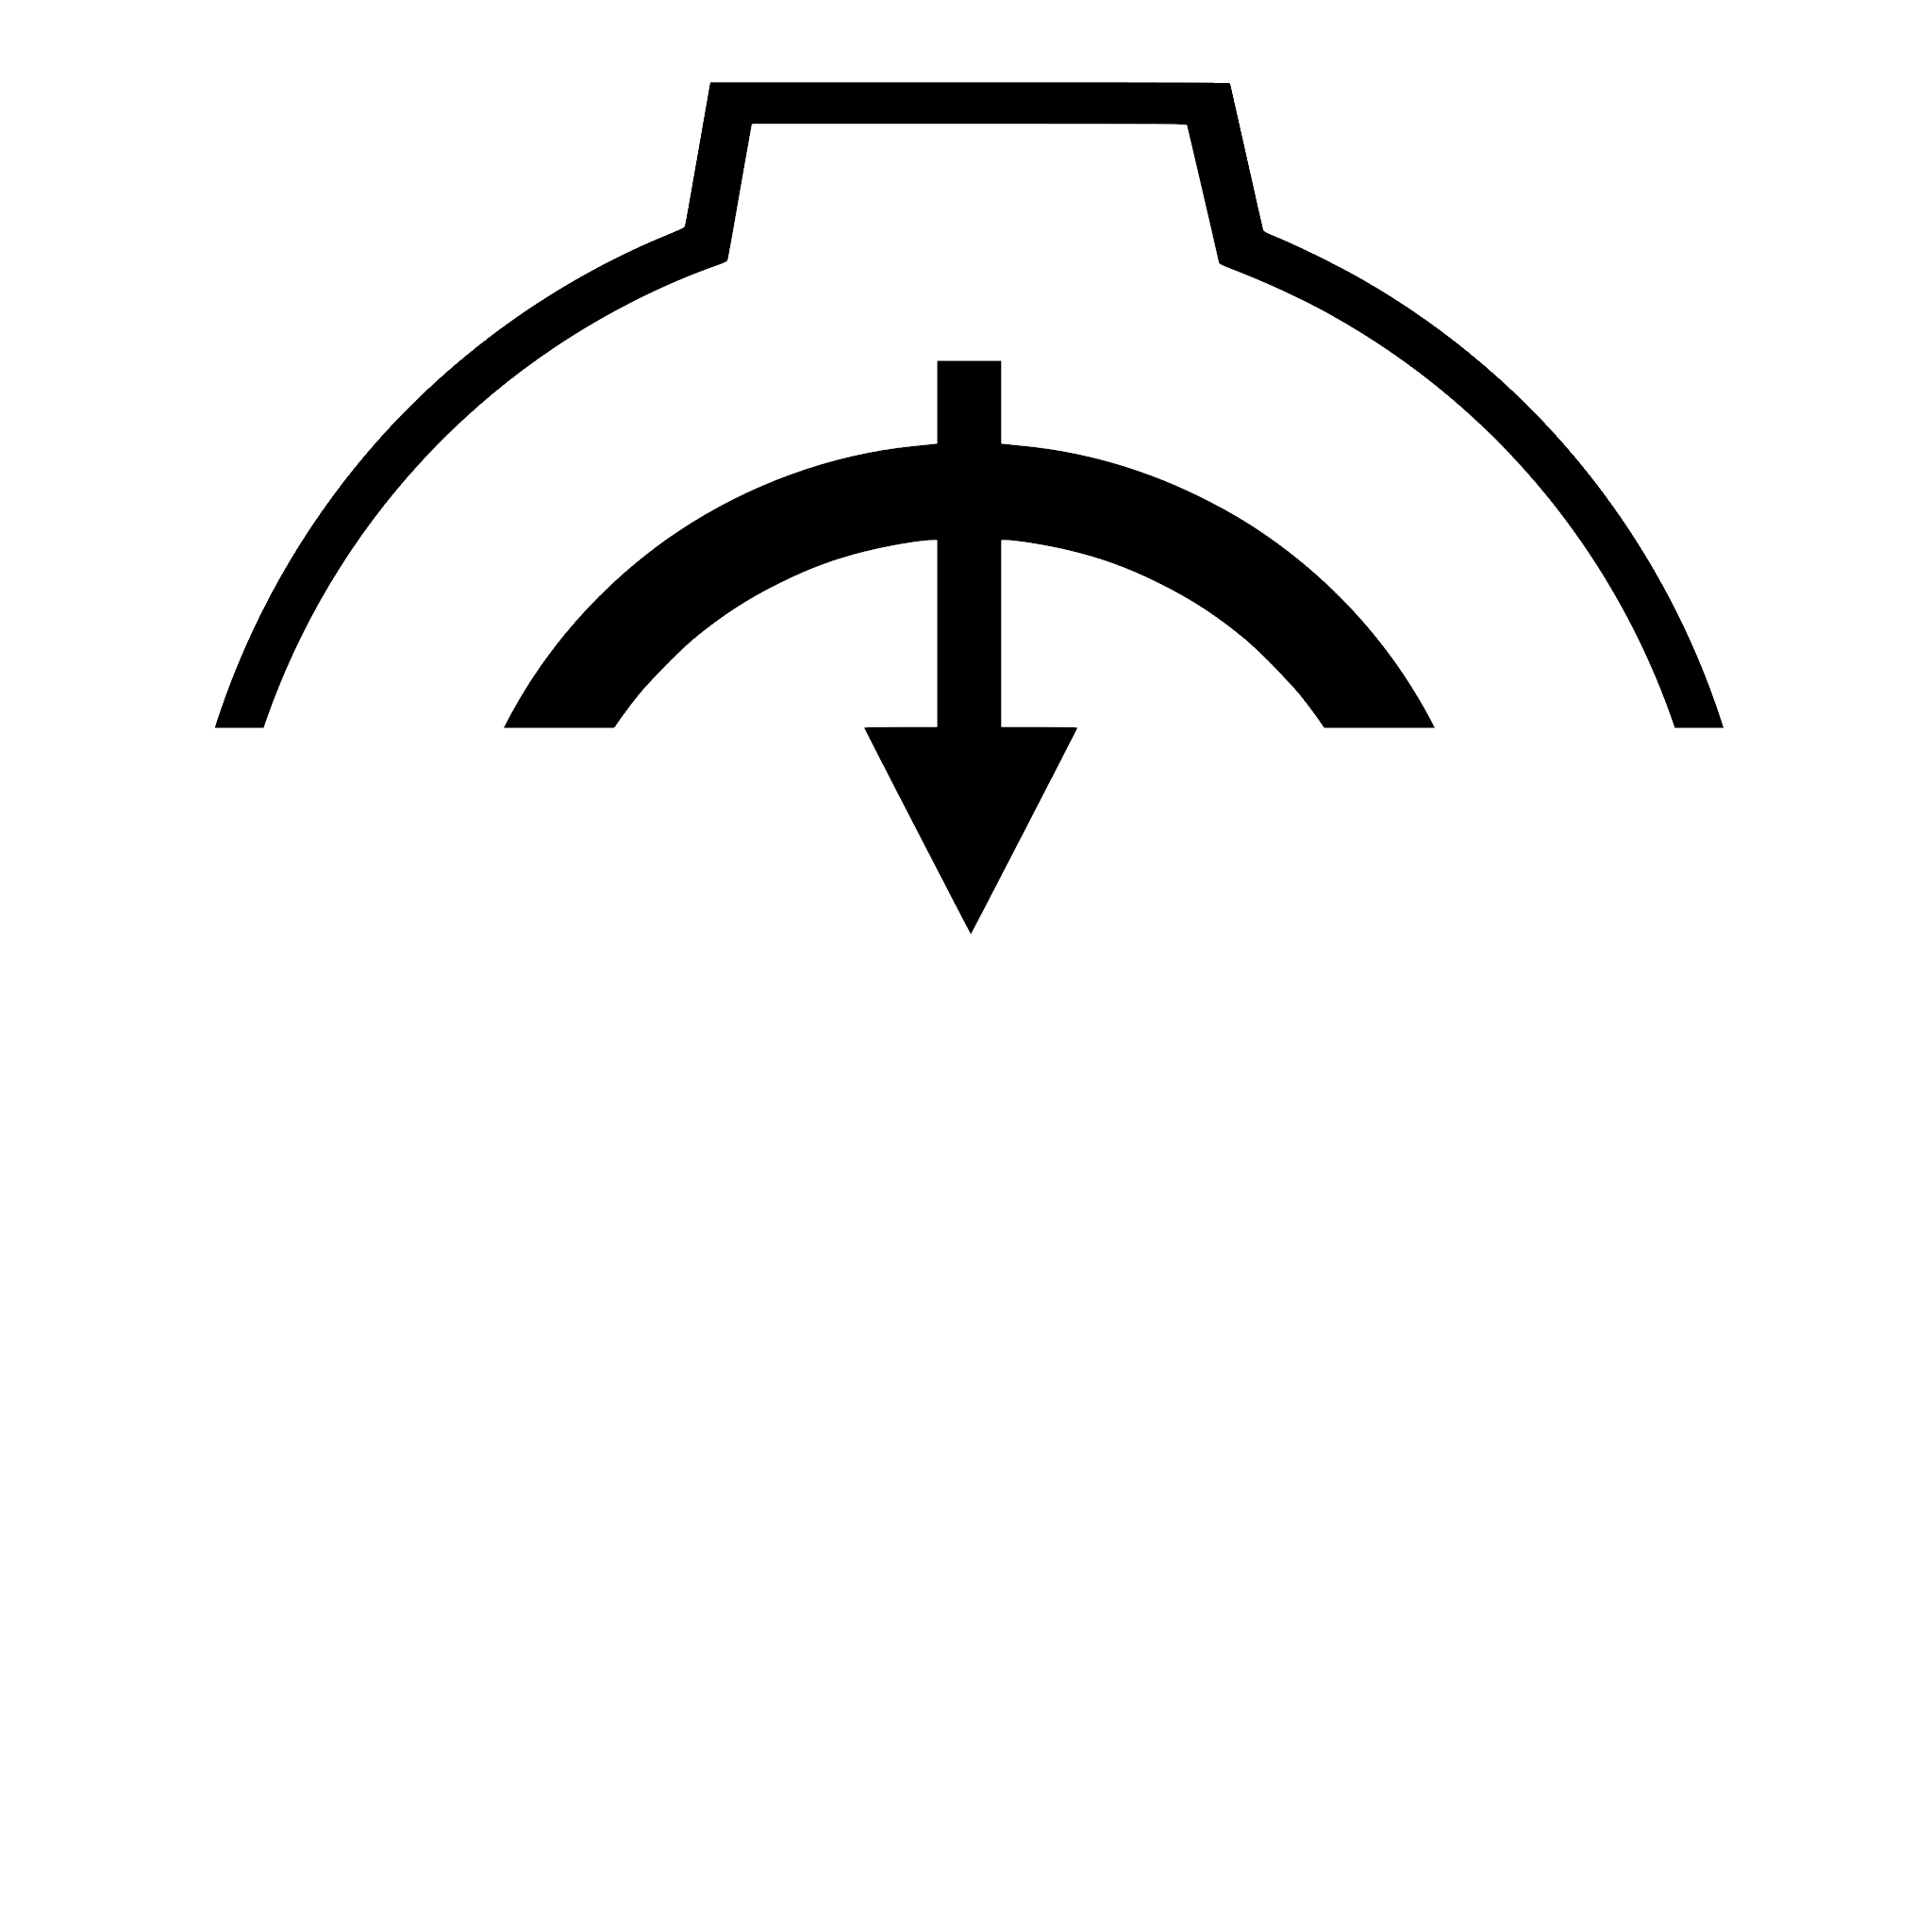 SCP_Foundation_(emblem)_cockroach_top.png